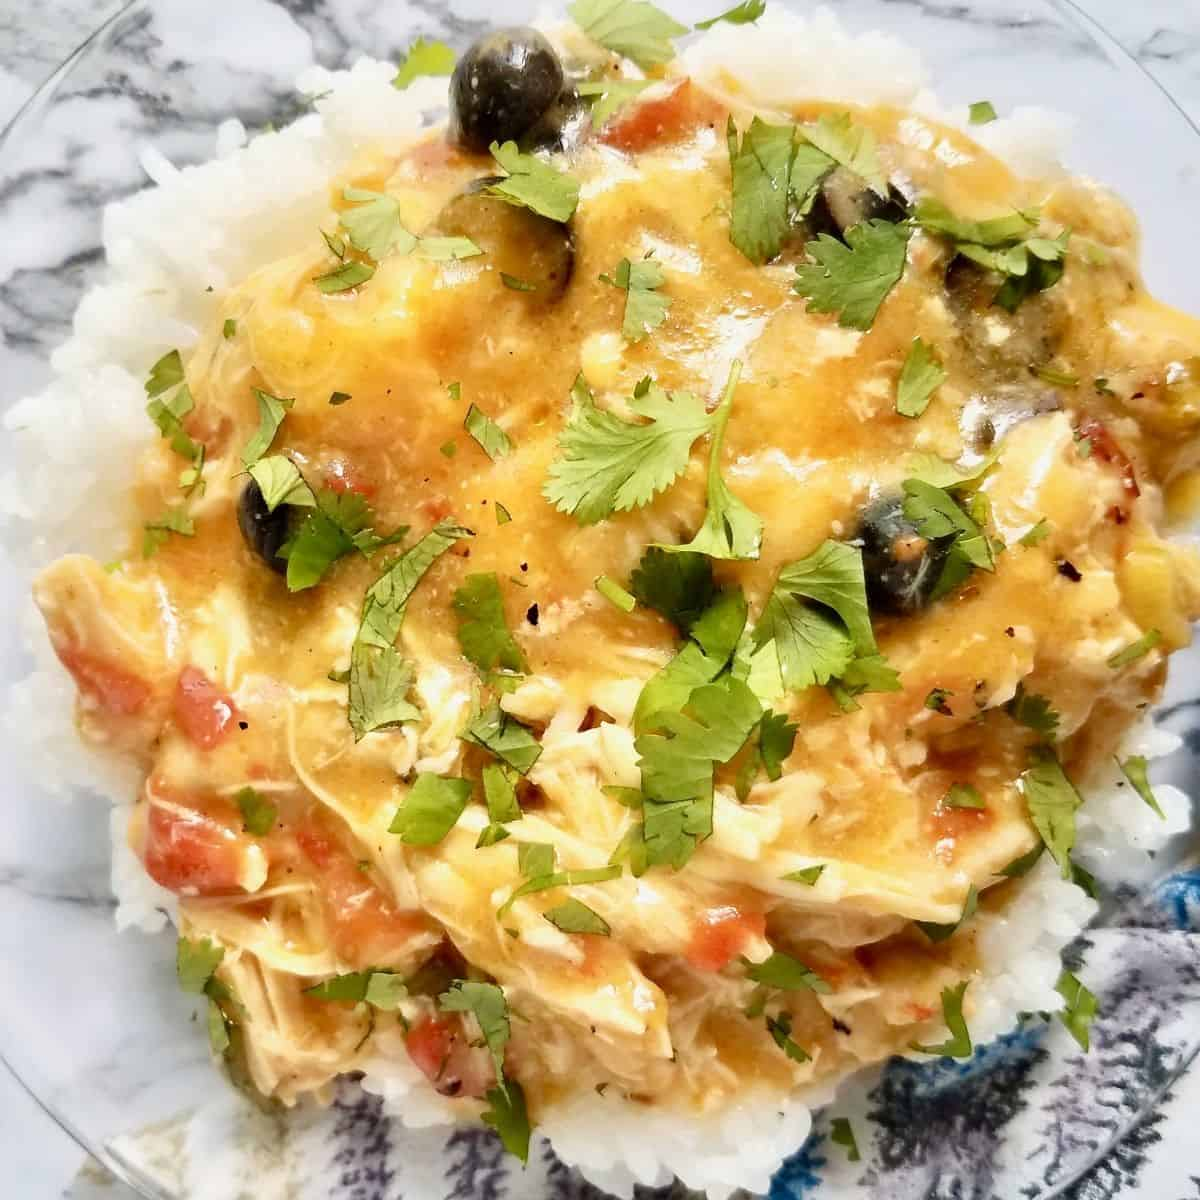 Creamy Mexican Chicken Crockpot Recipe